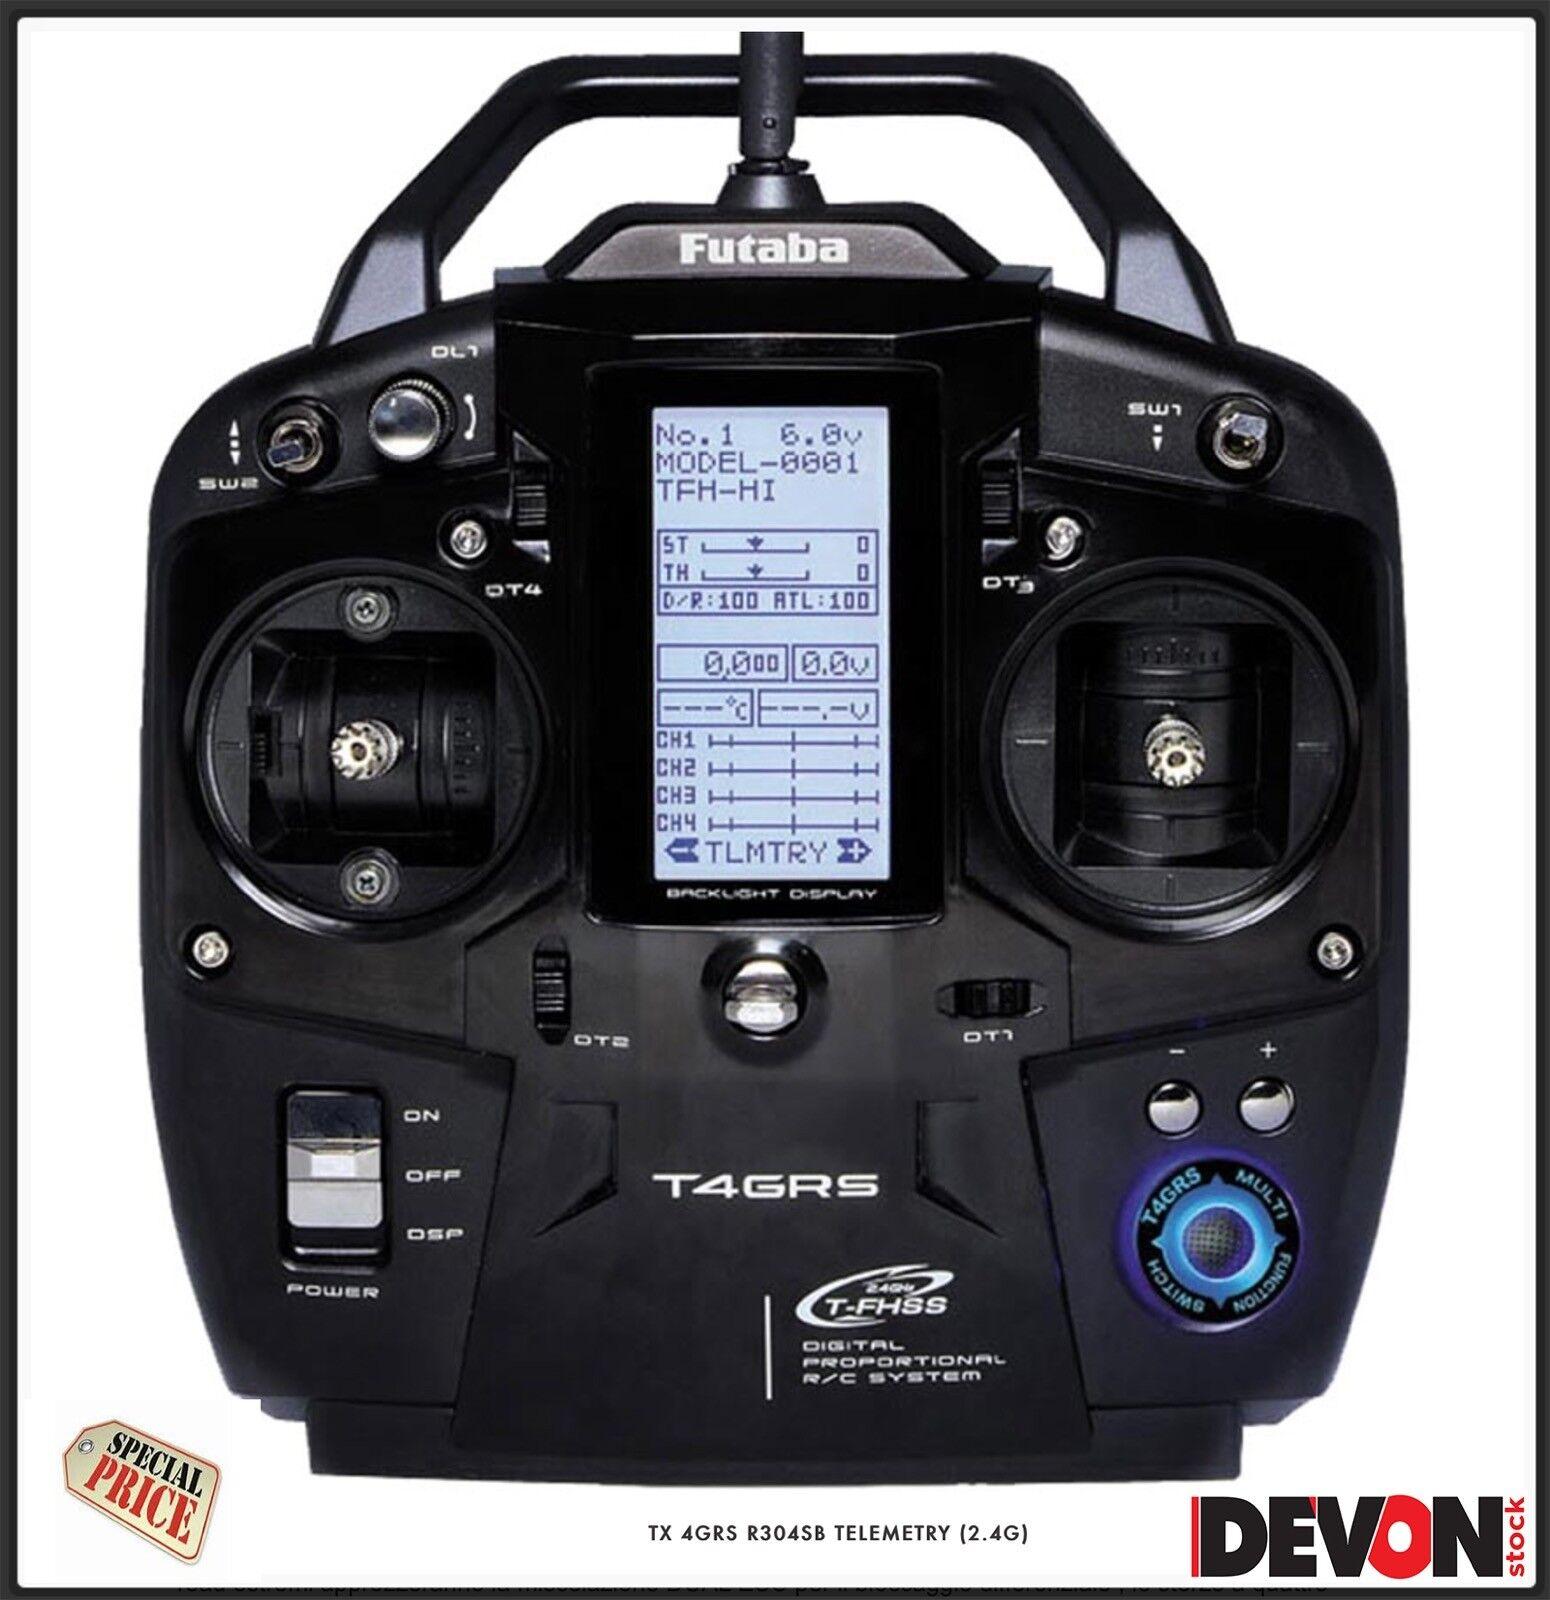 Radio control Futaba 4GRS receiver R304SB TELEMETRY 2.4 scaler crawler 4 X 4 rc